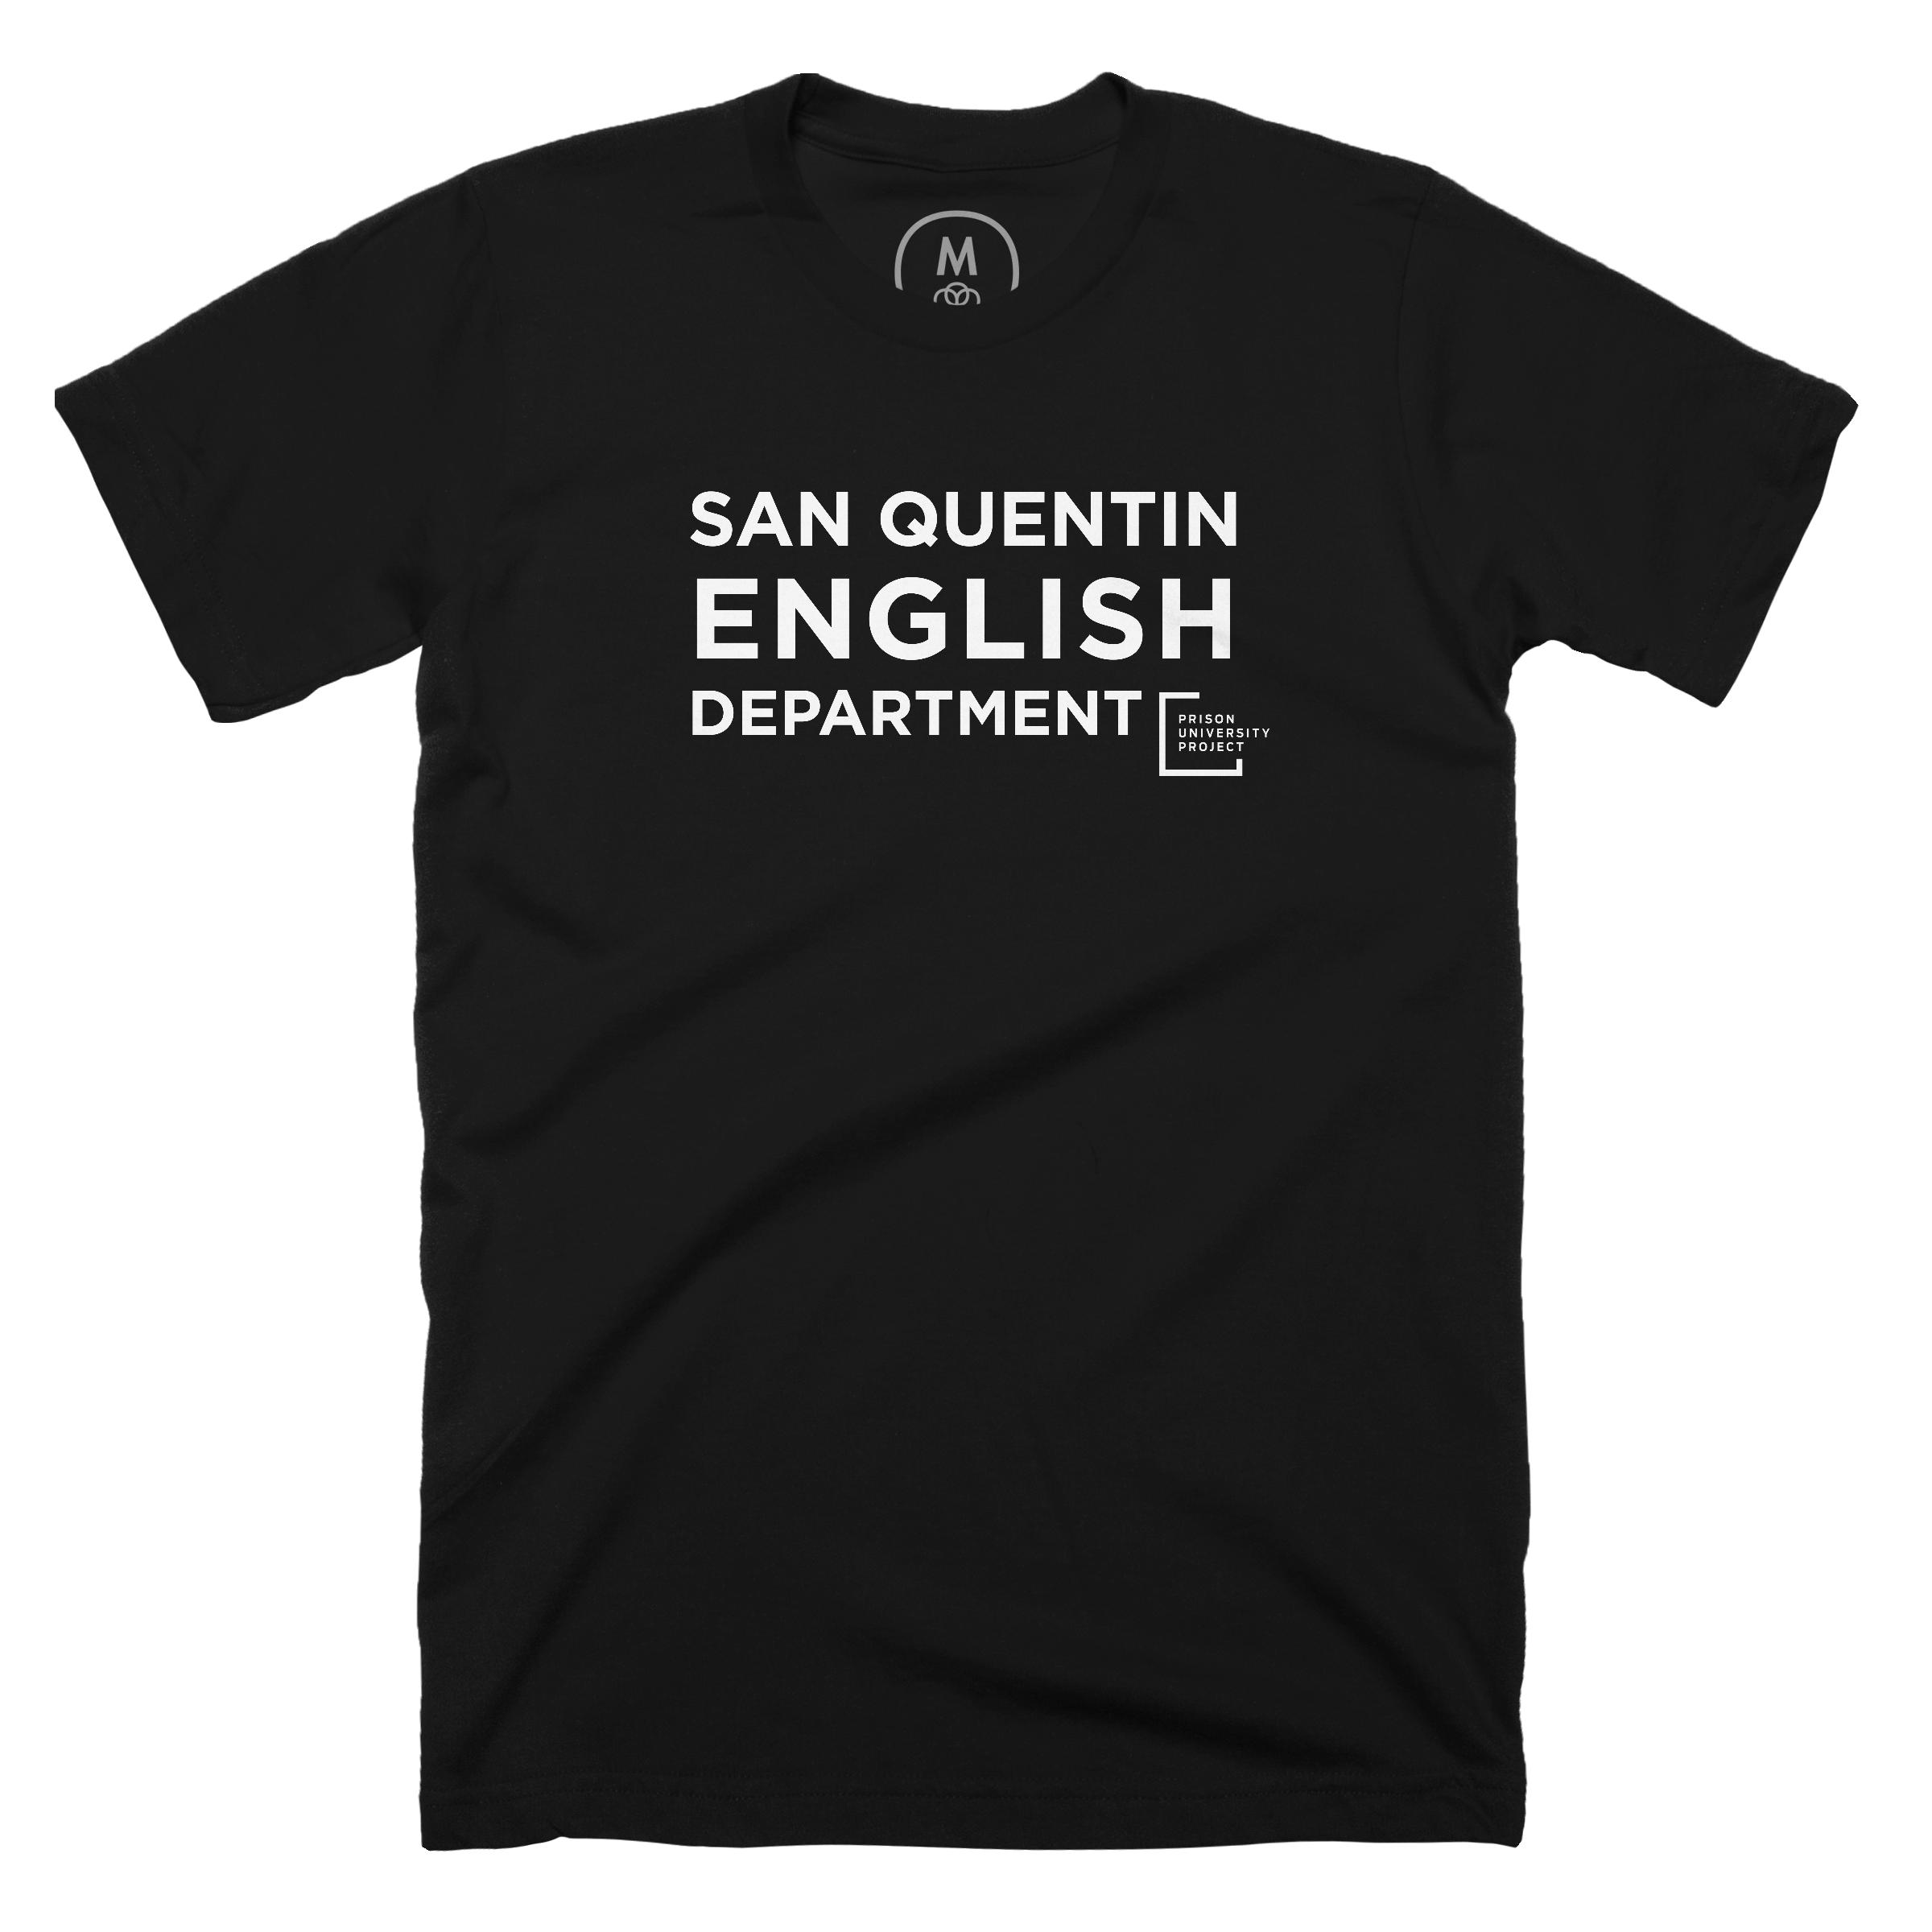 San Quentin English Department Black (Men's)